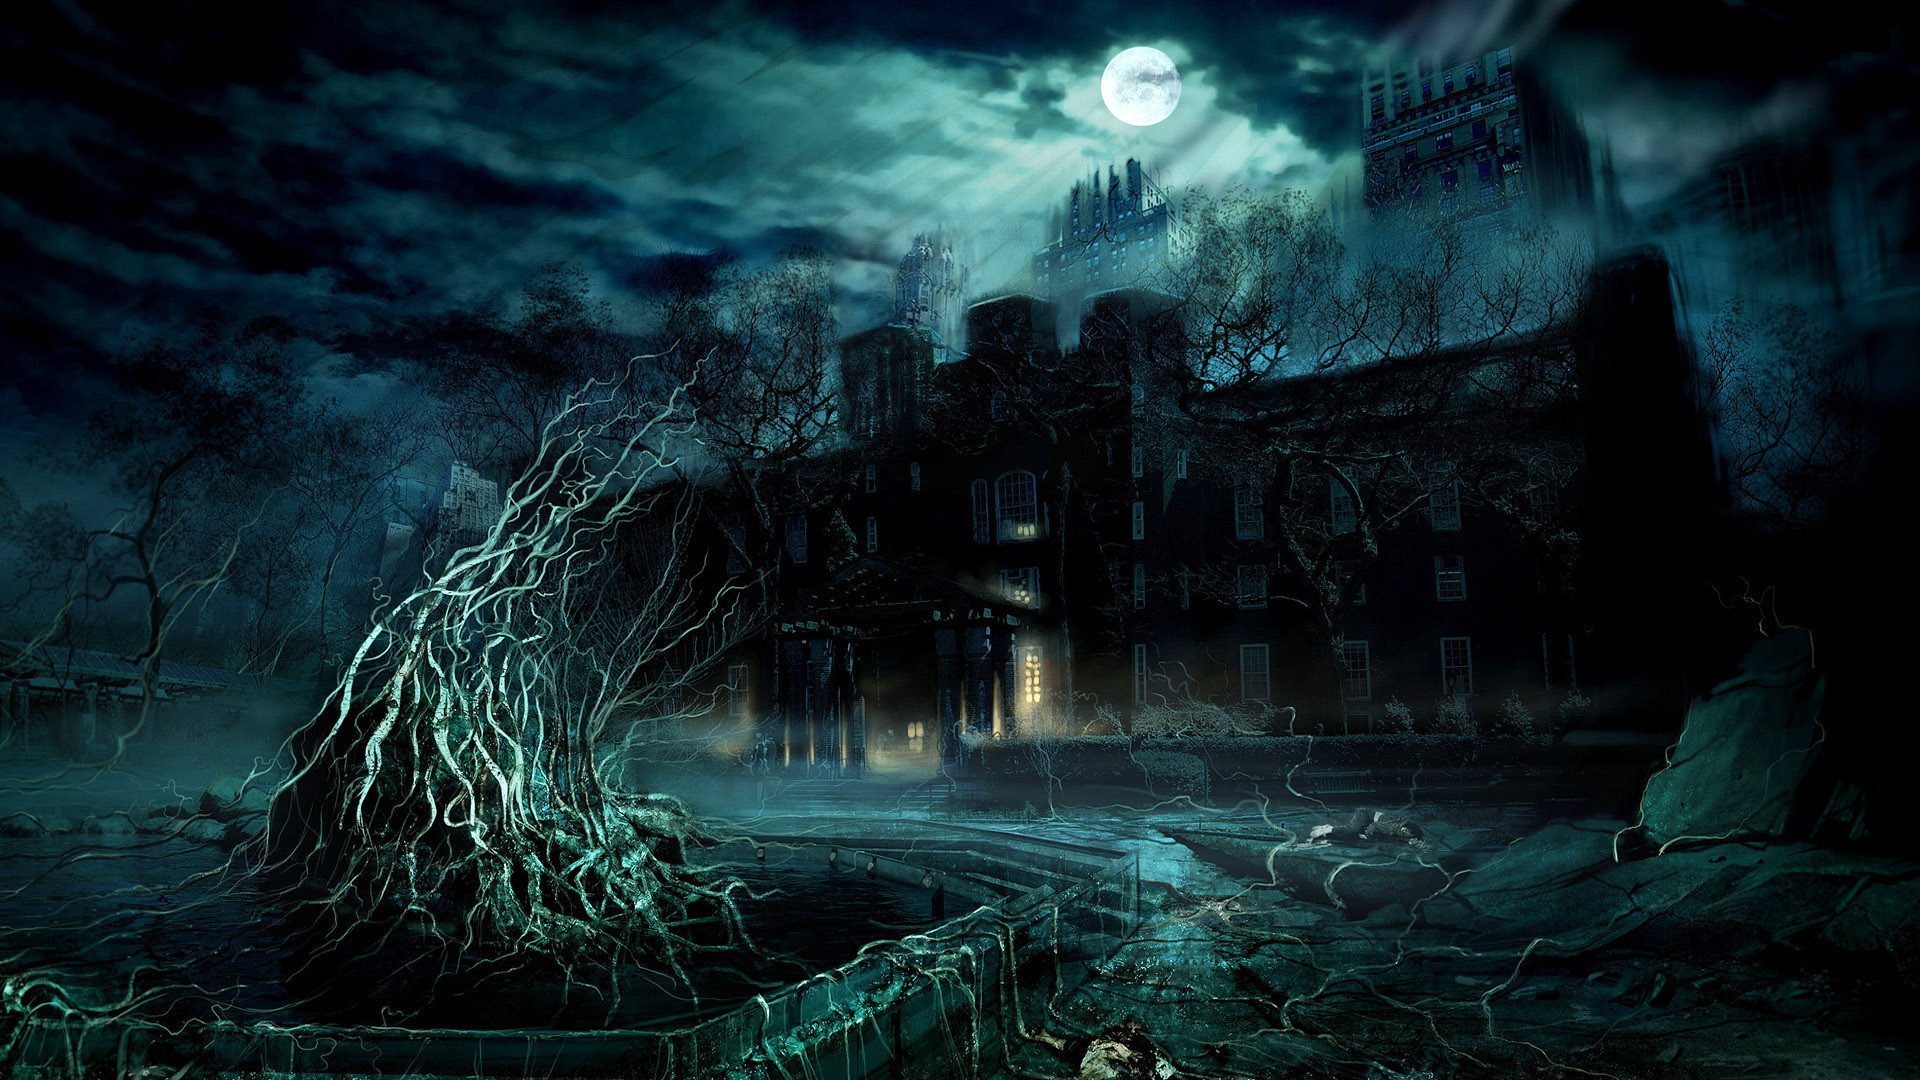 halloween monster window silhouettes